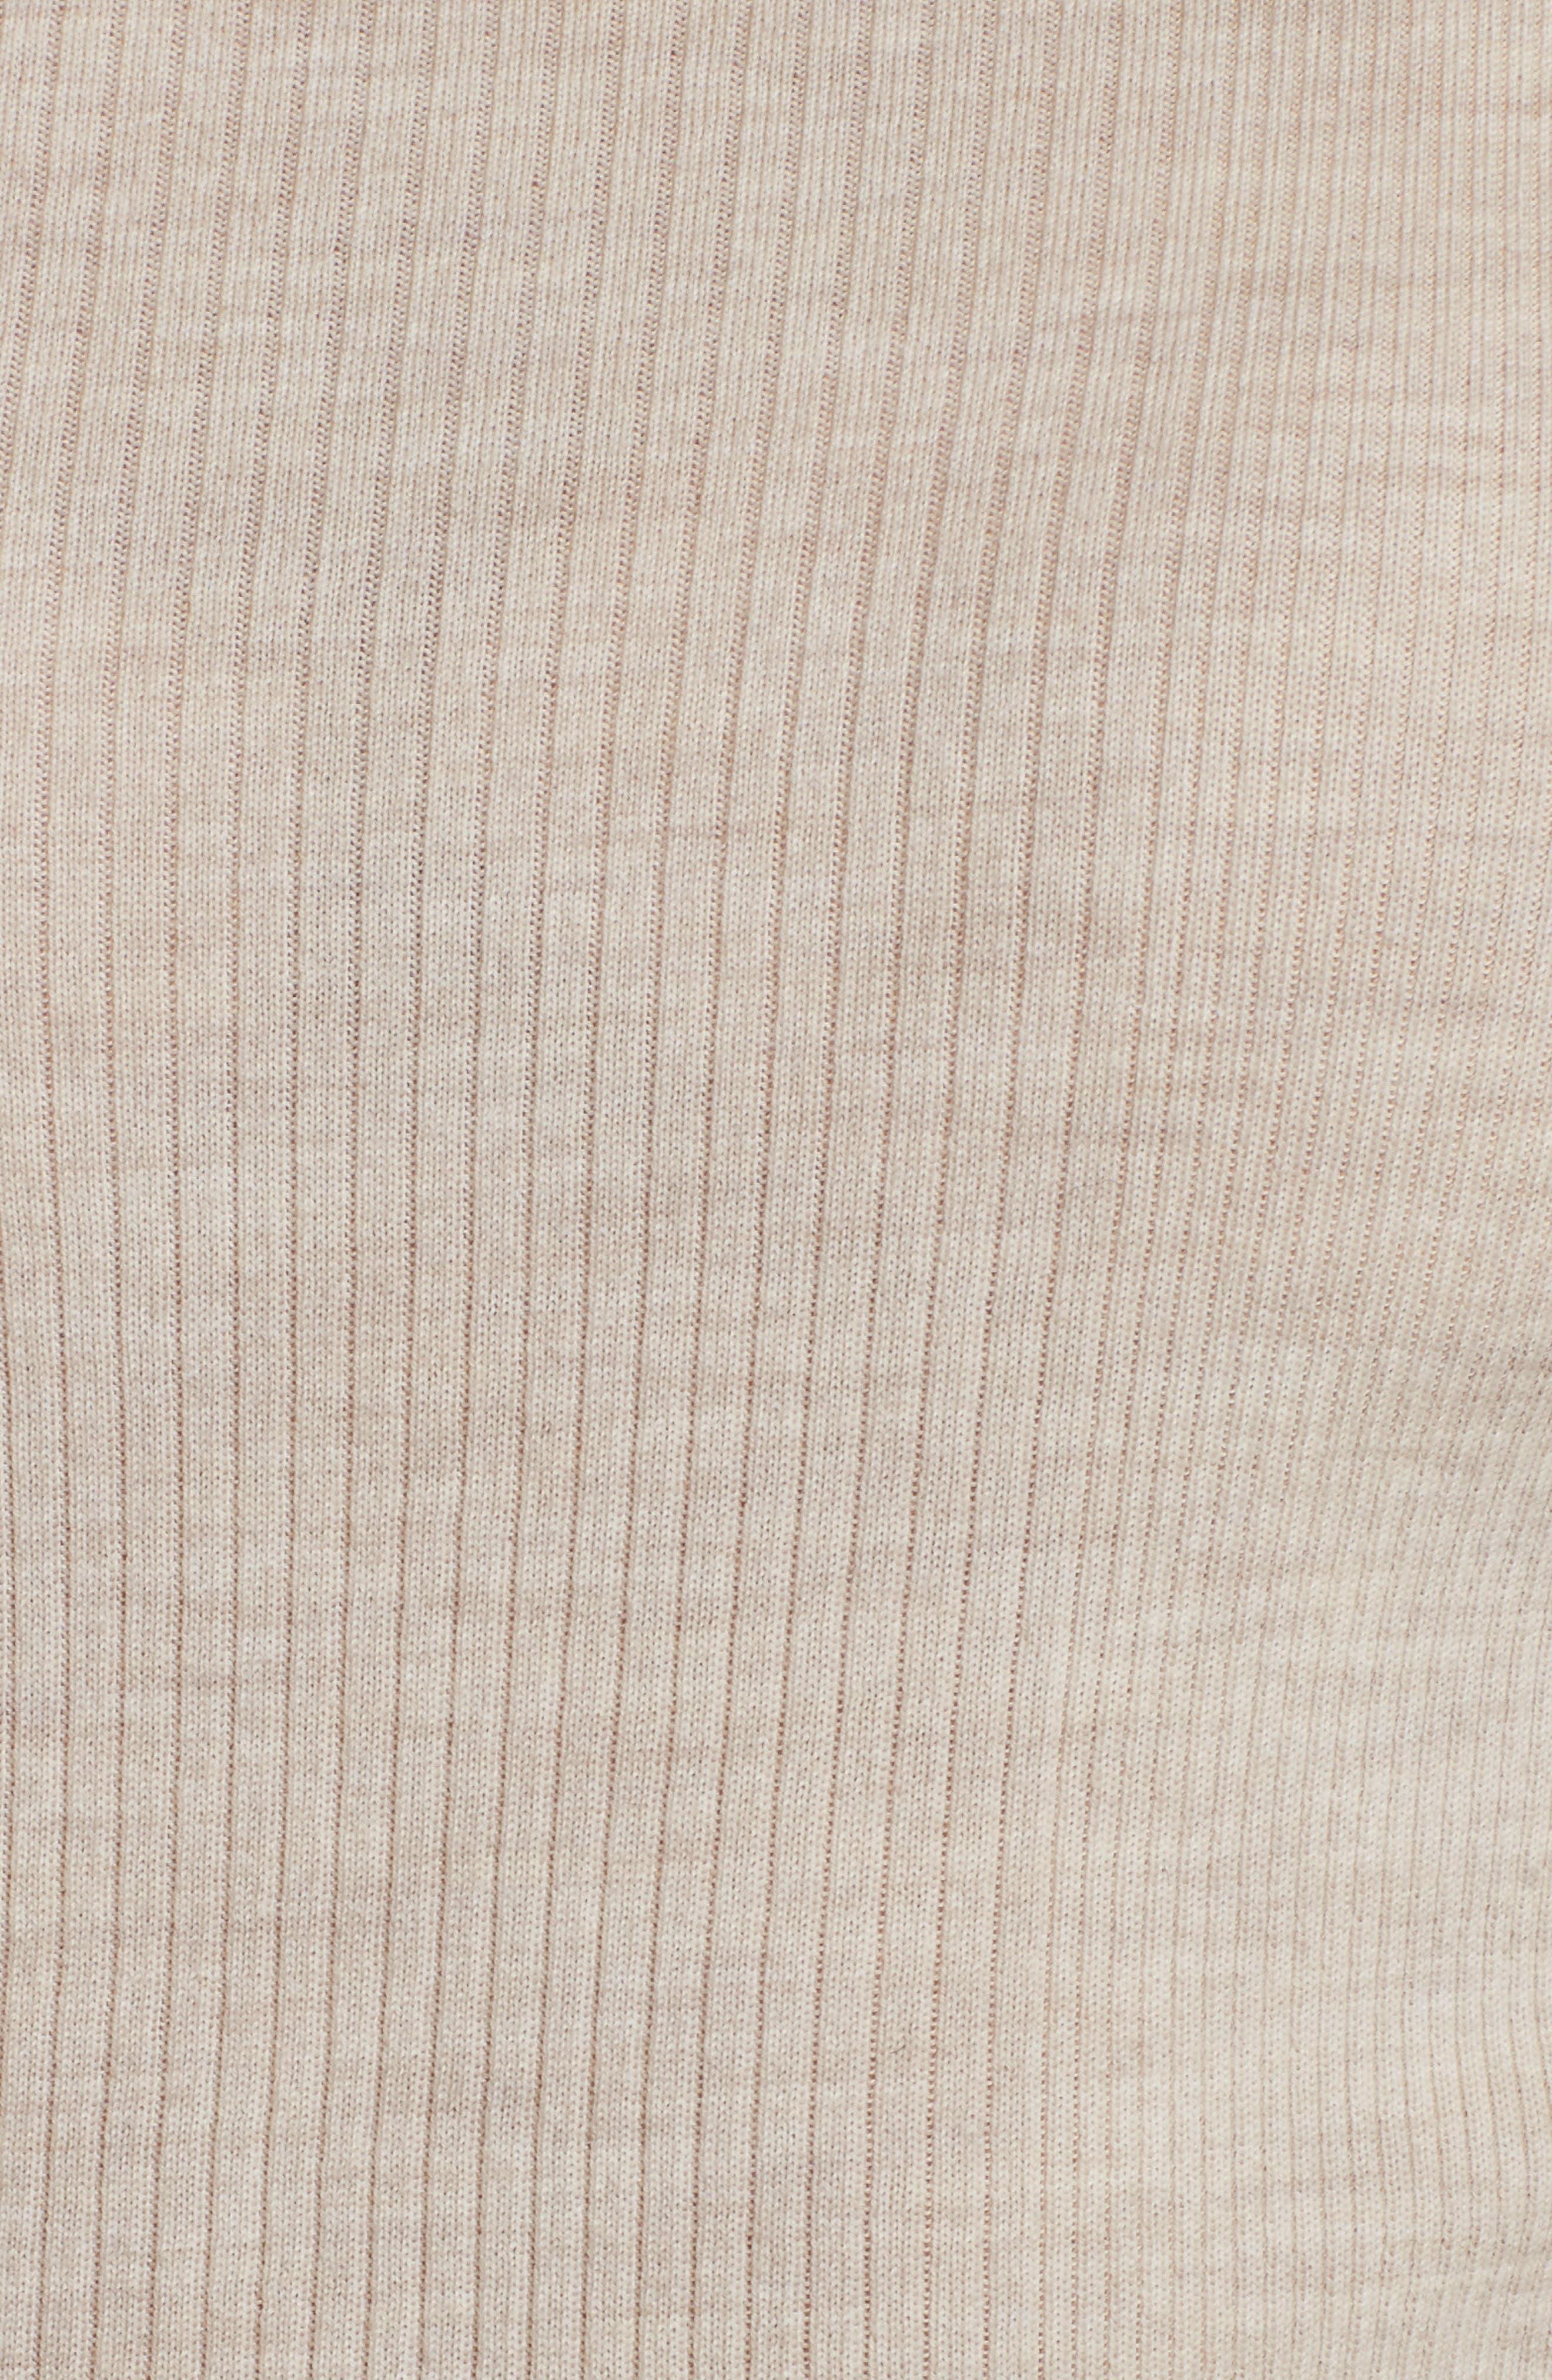 Merino Wool Blend Sweater,                             Alternate thumbnail 13, color,